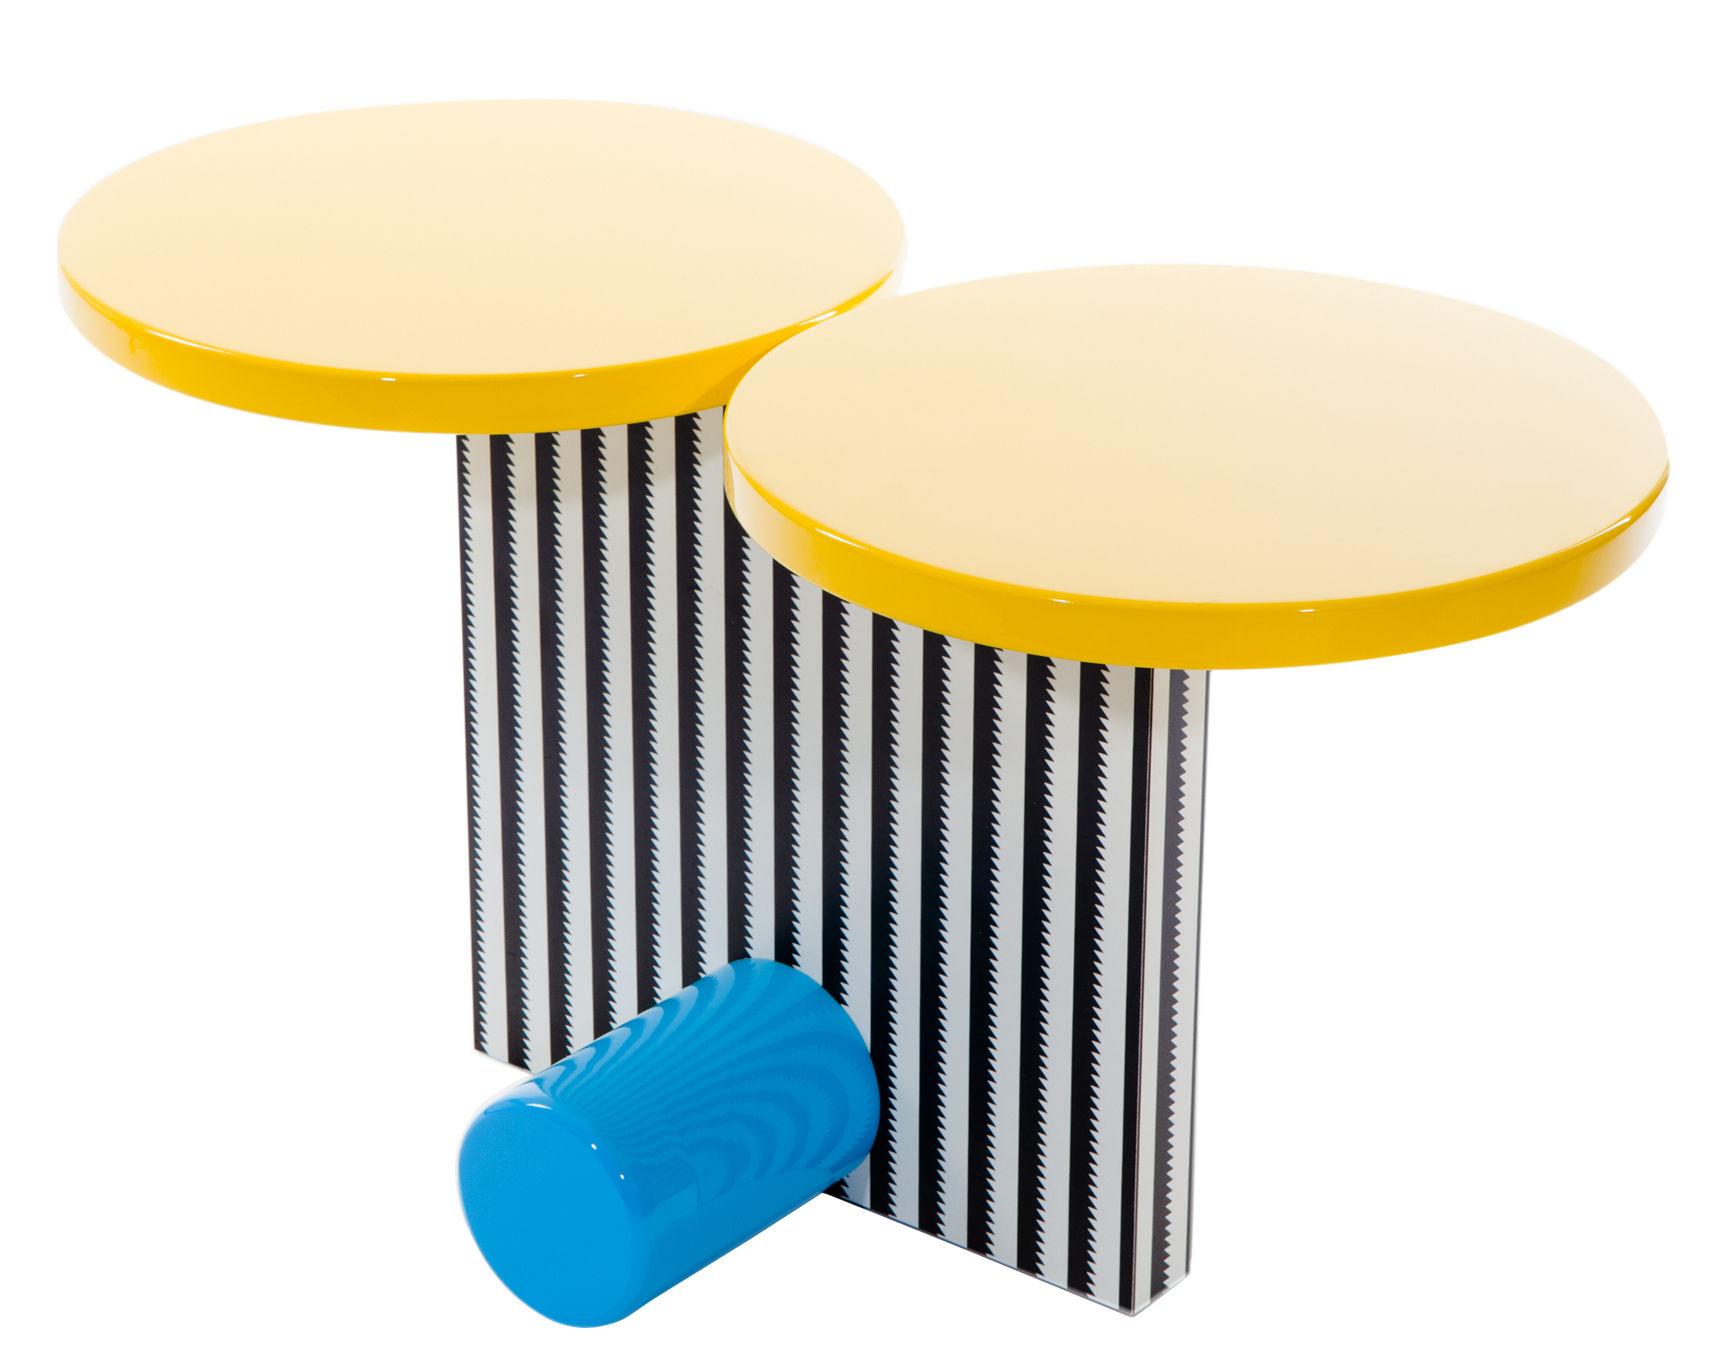 Table d 39 appoint polar by michele de lucchi 1984 multicolore memphis milano for Set de table multicolore